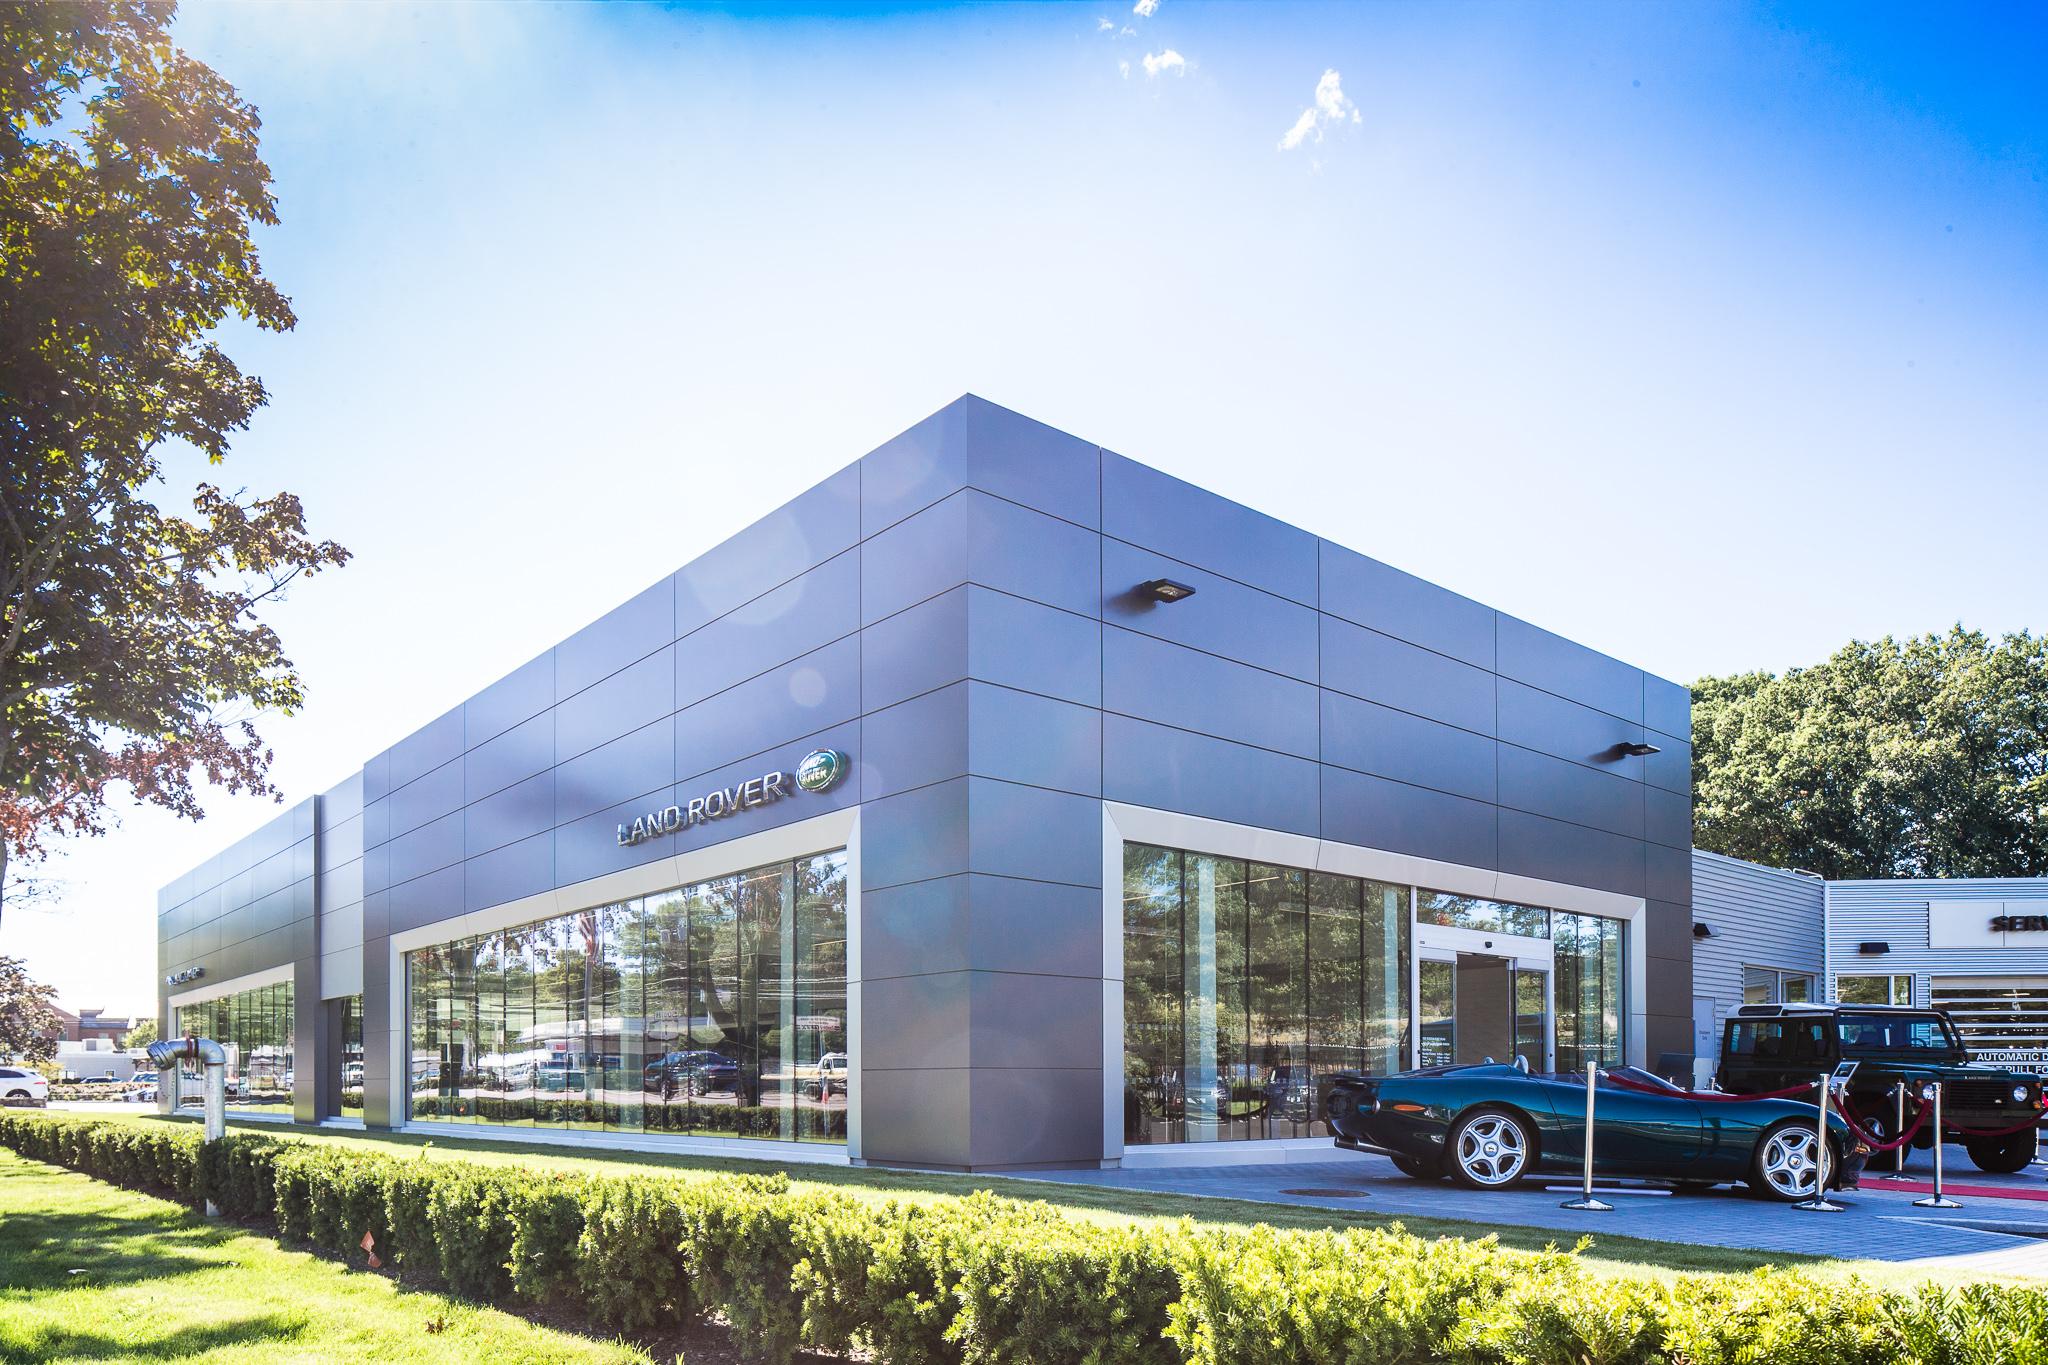 Volvo Dealers In Ct >> Penske JLR Dealership First to Adopt New Global Design ...